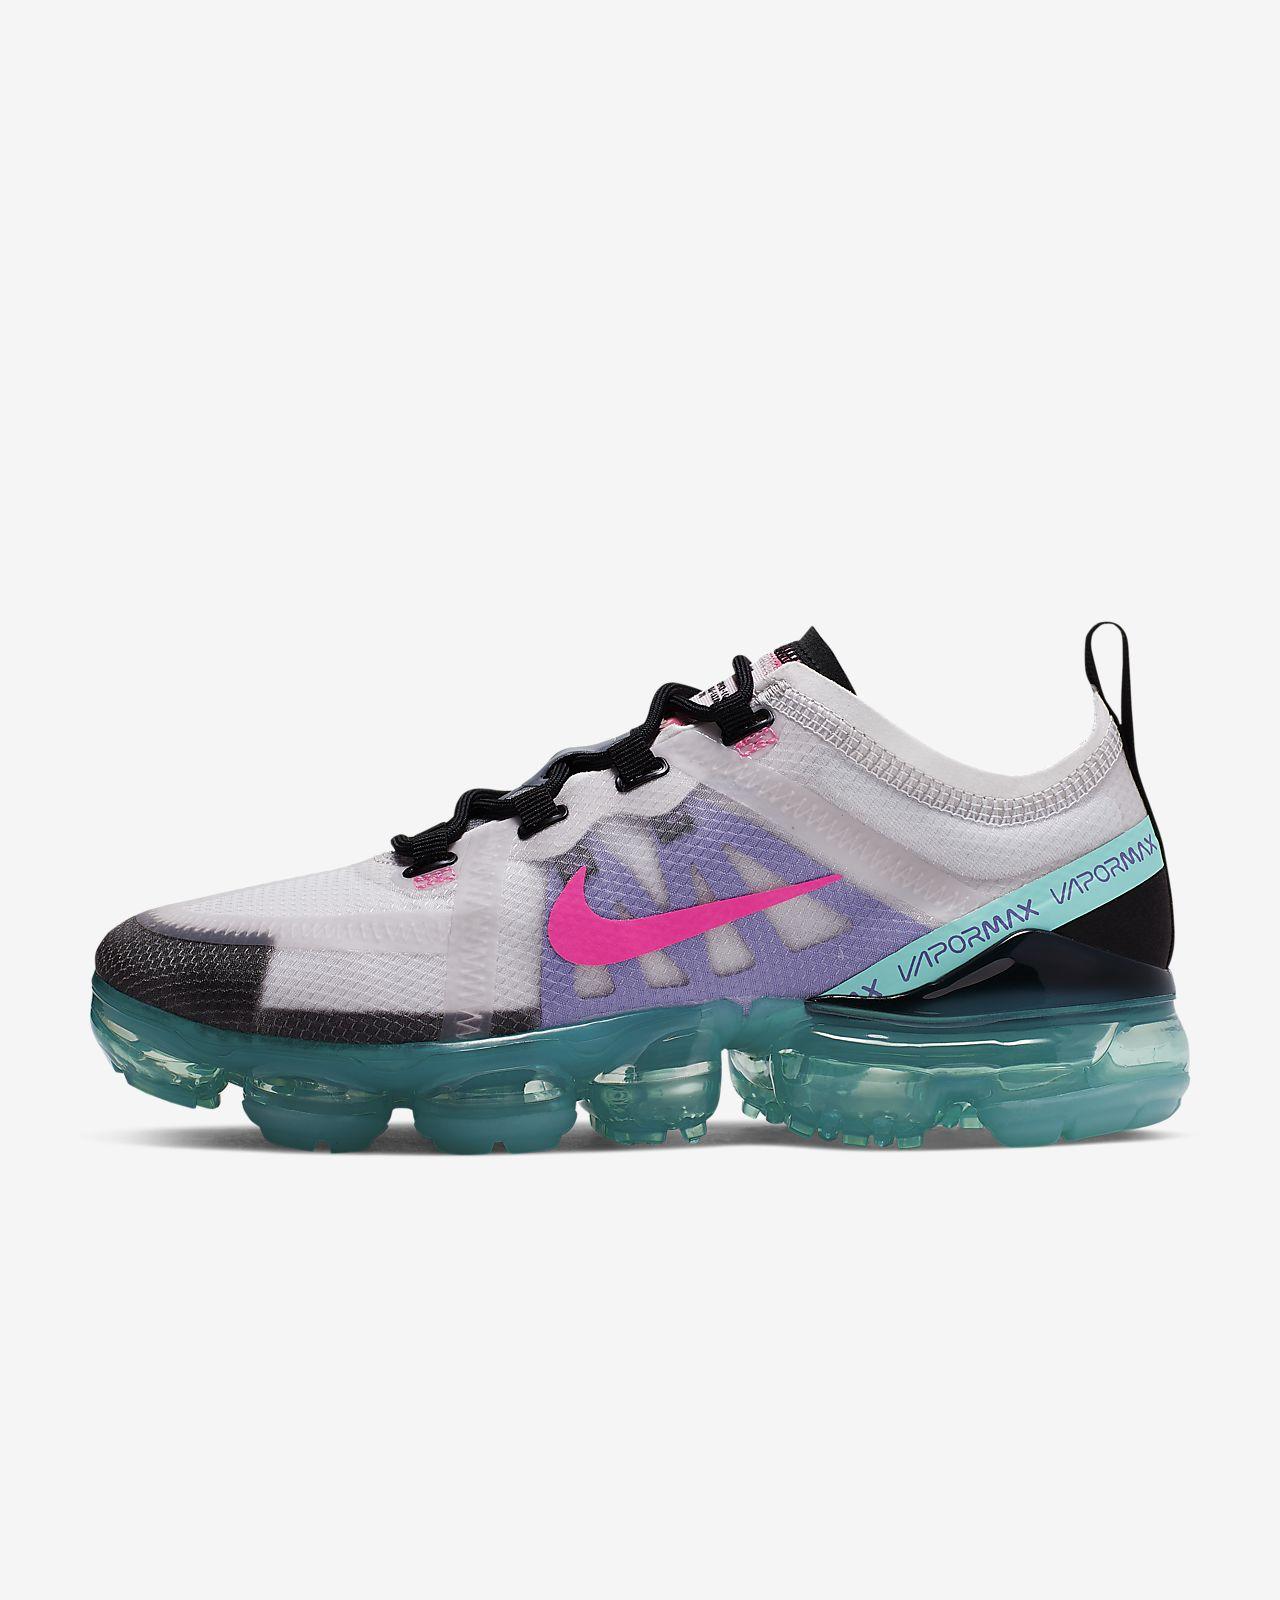 Chaussure Nike Air VaporMax 2019 pour Femme